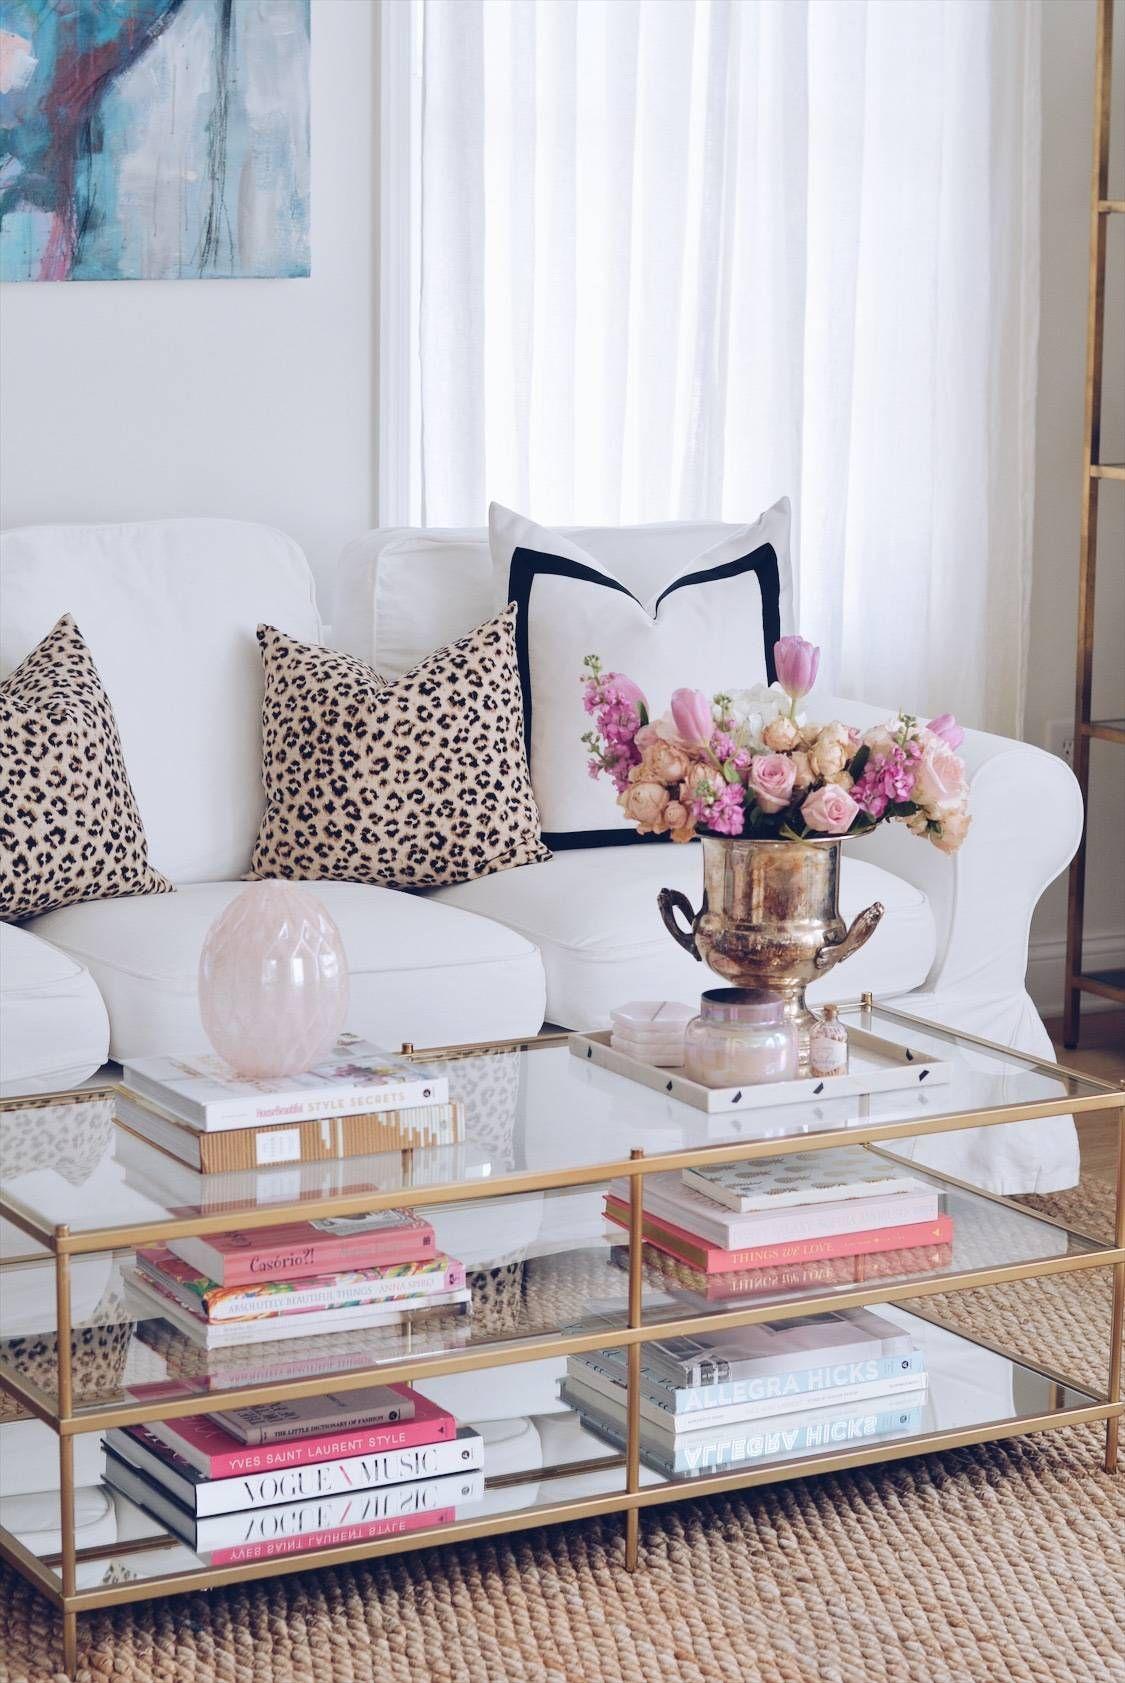 Elegant Spring Home Tour And Easter Decor 2019 Coffe Table Decor Elegant Home Decor Spring Home Decor